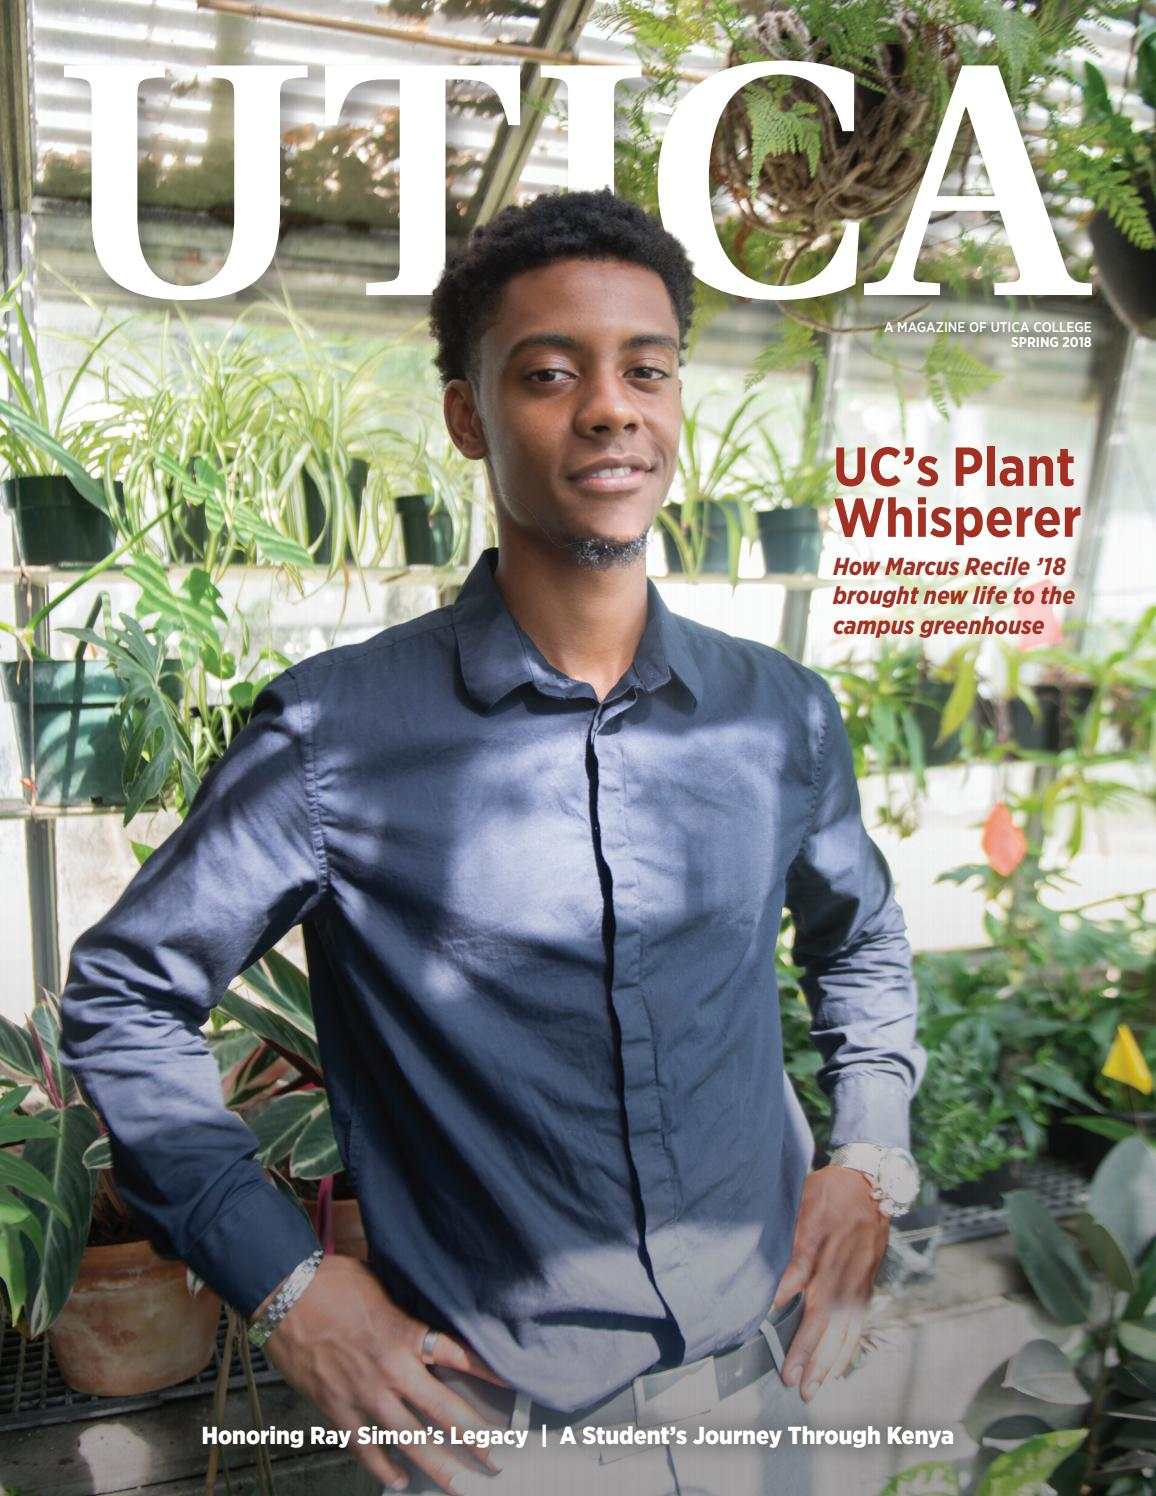 e6b1b967ae6d Utica Magazine - Spring 2018 by Utica College - issuu